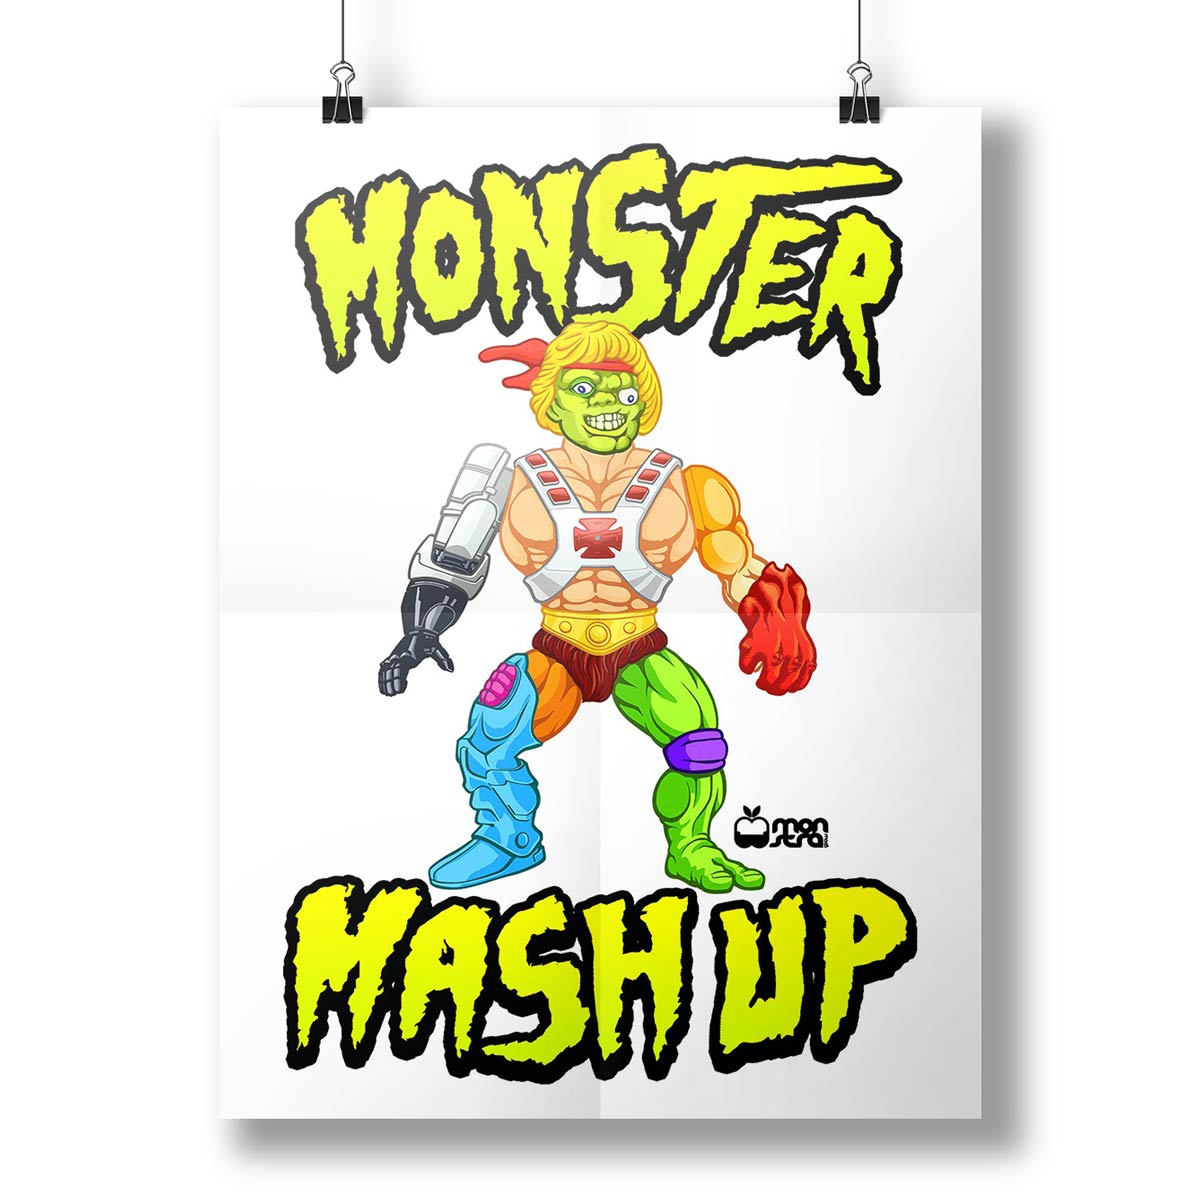 Pôster Monstra Maçã Monster Mash Up